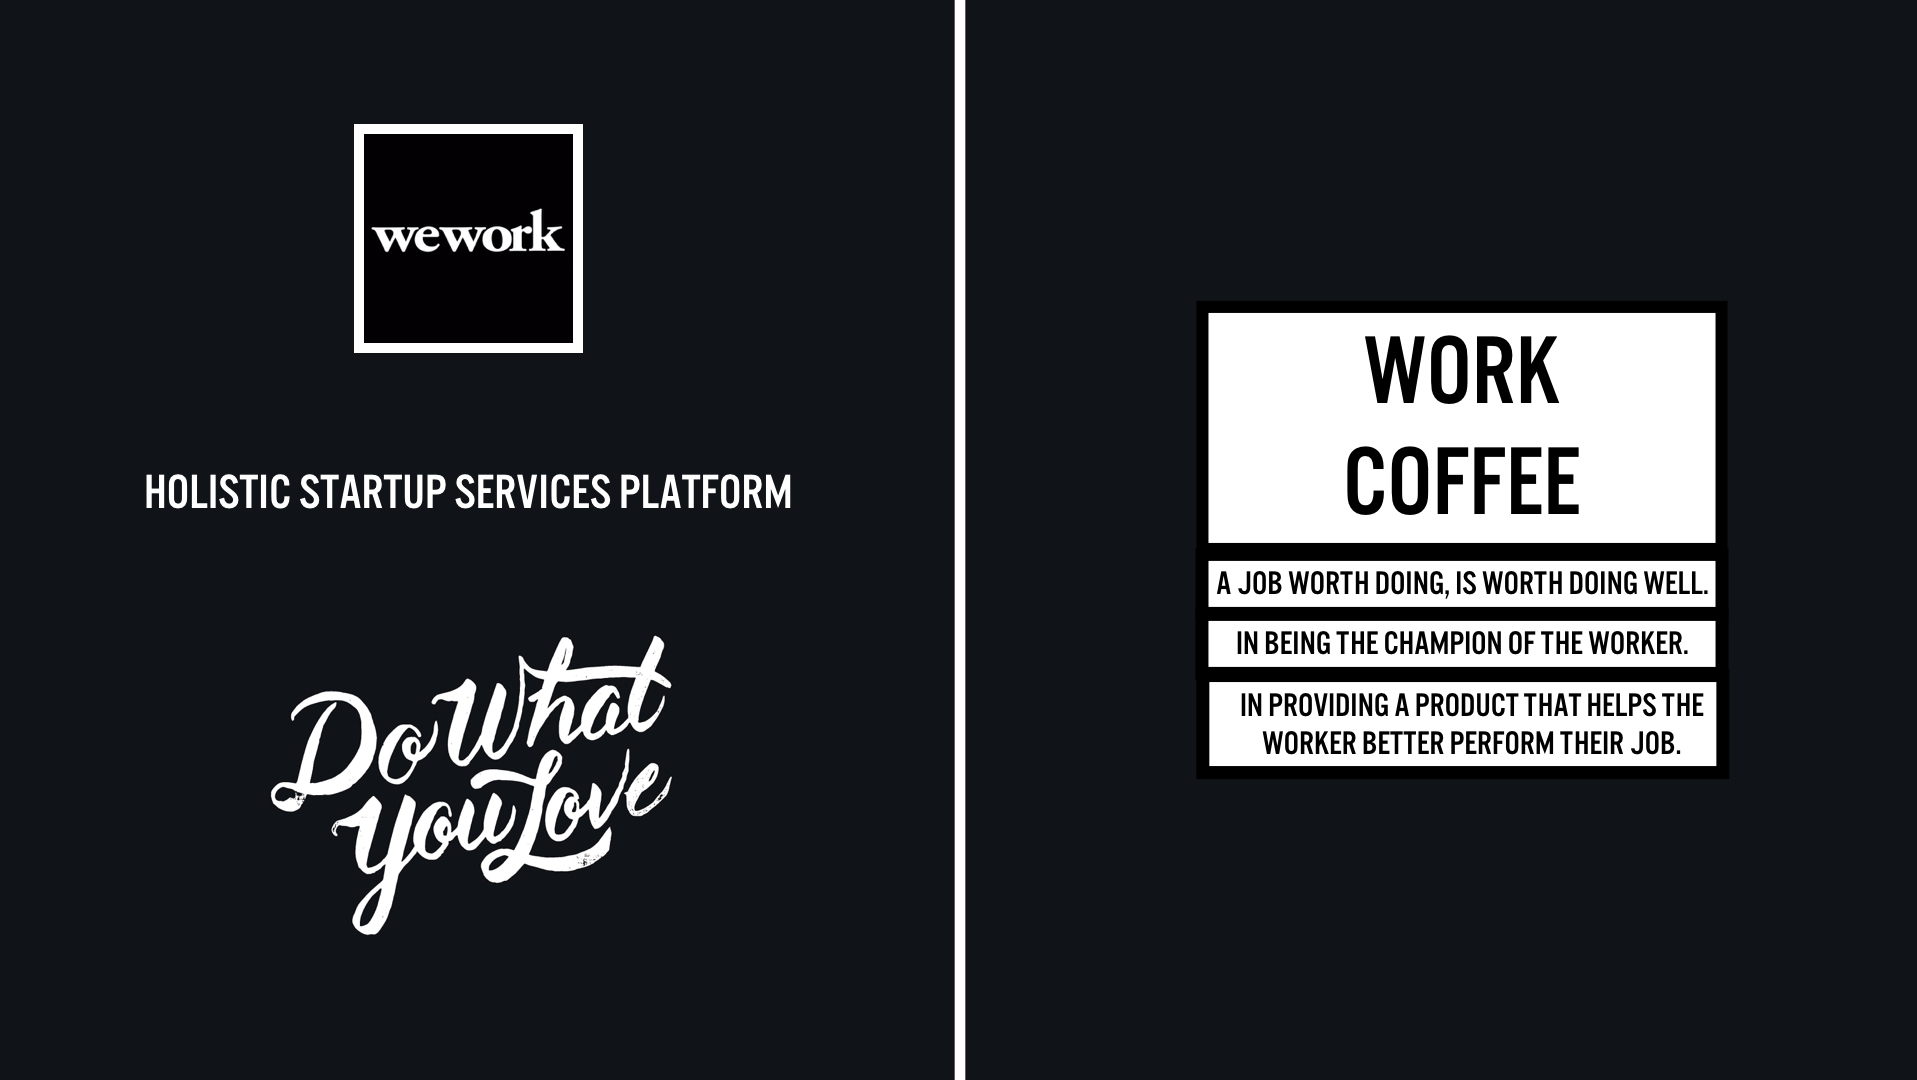 WORK COFFEE PRESENTATION FINAL.046.jpeg